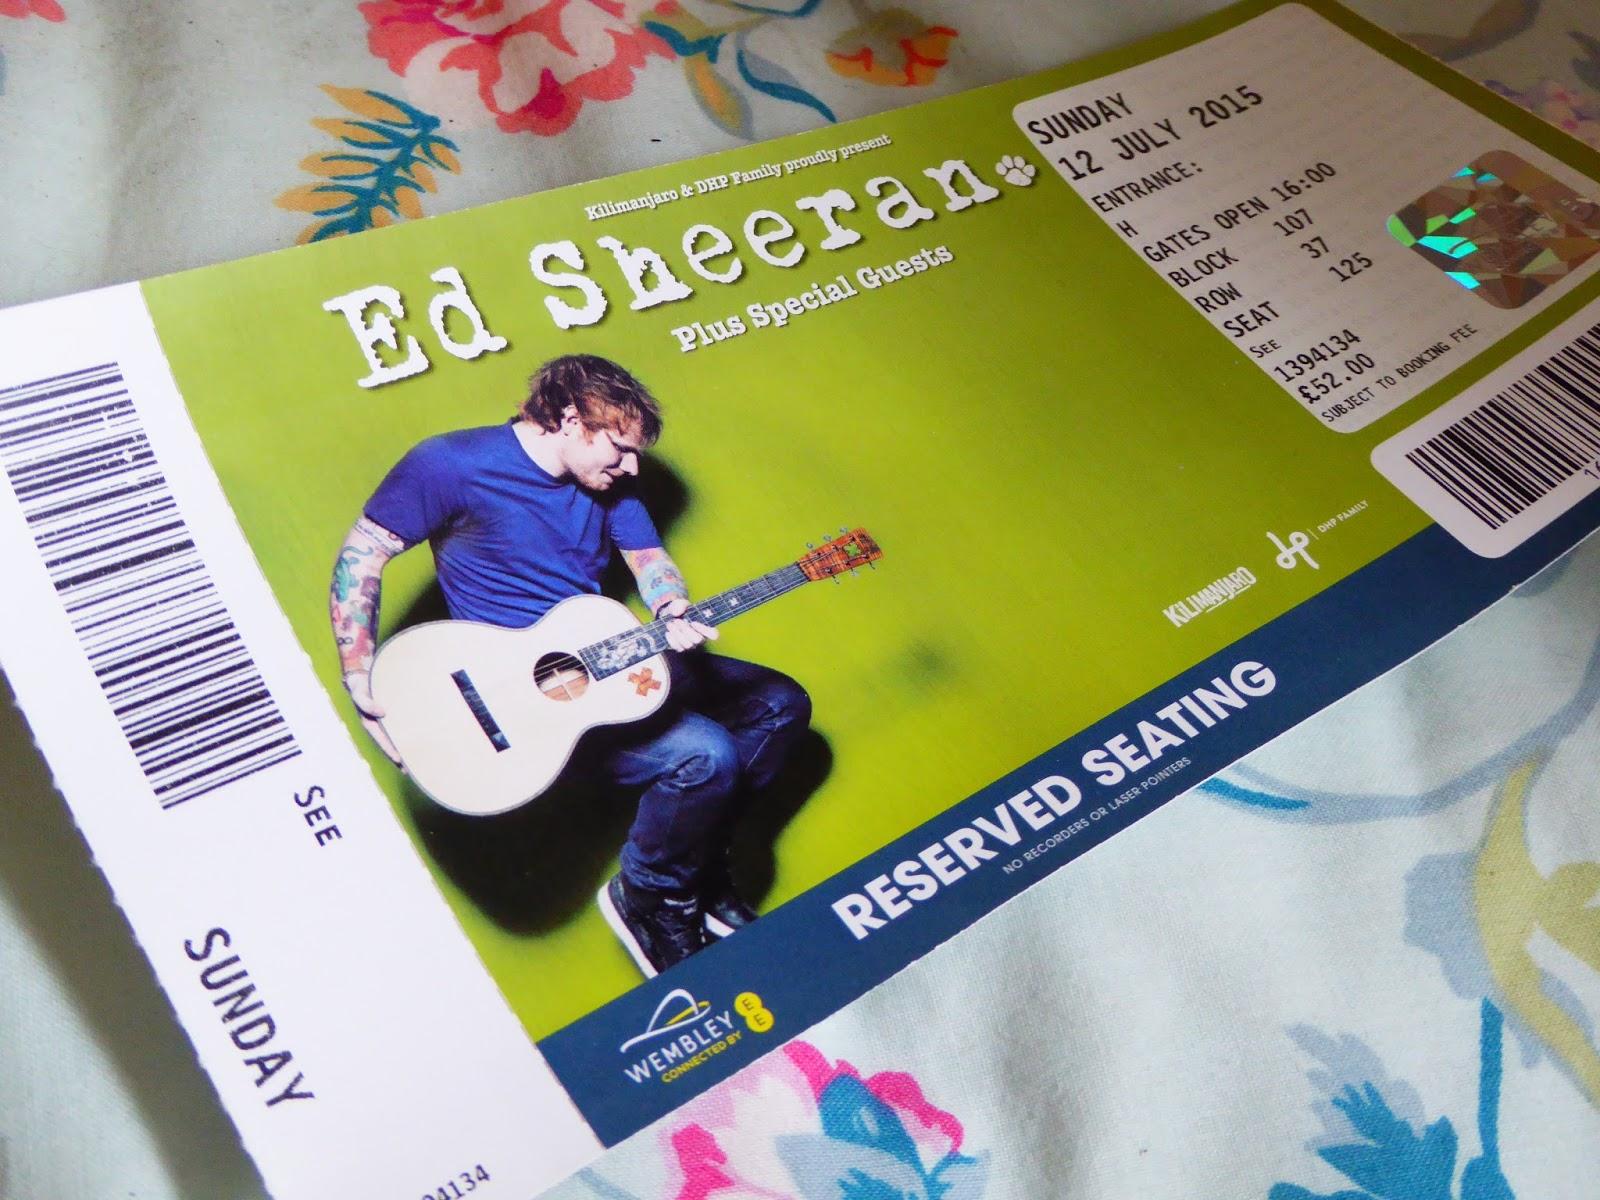 how to win ed sheeran tickets